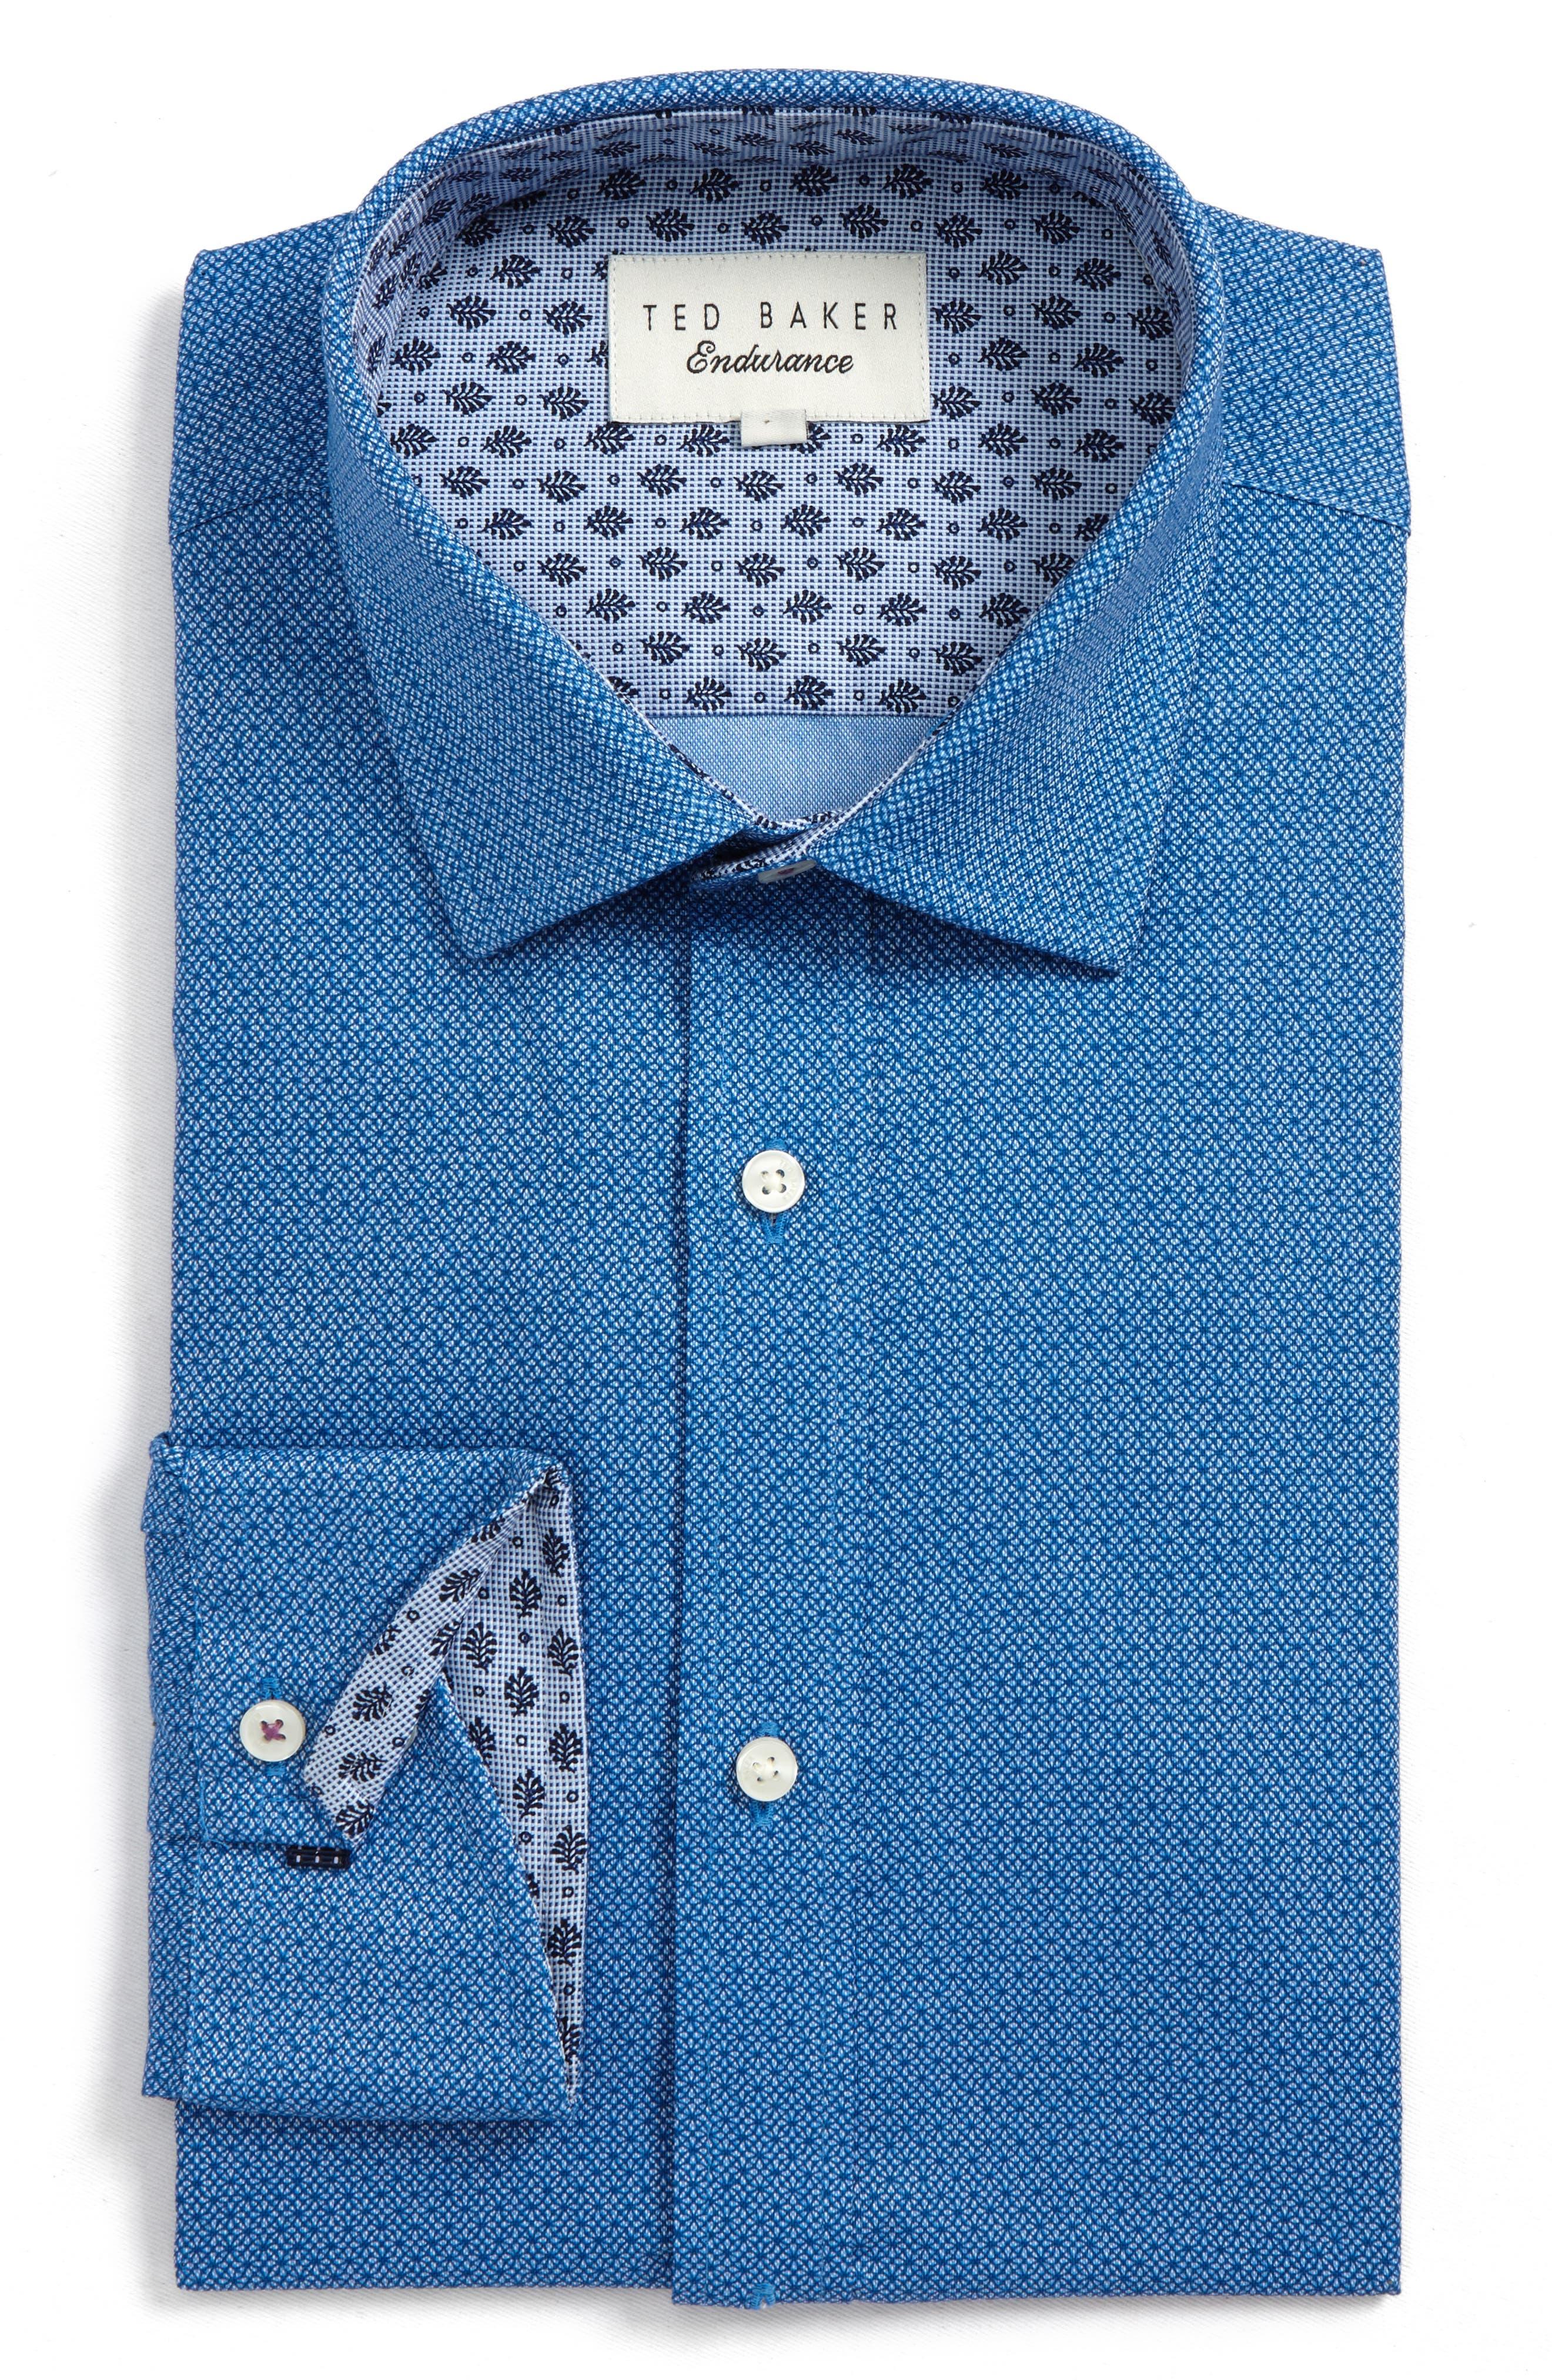 Endurance Murphy Trim Fit Dress Shirt,                         Main,                         color, 410